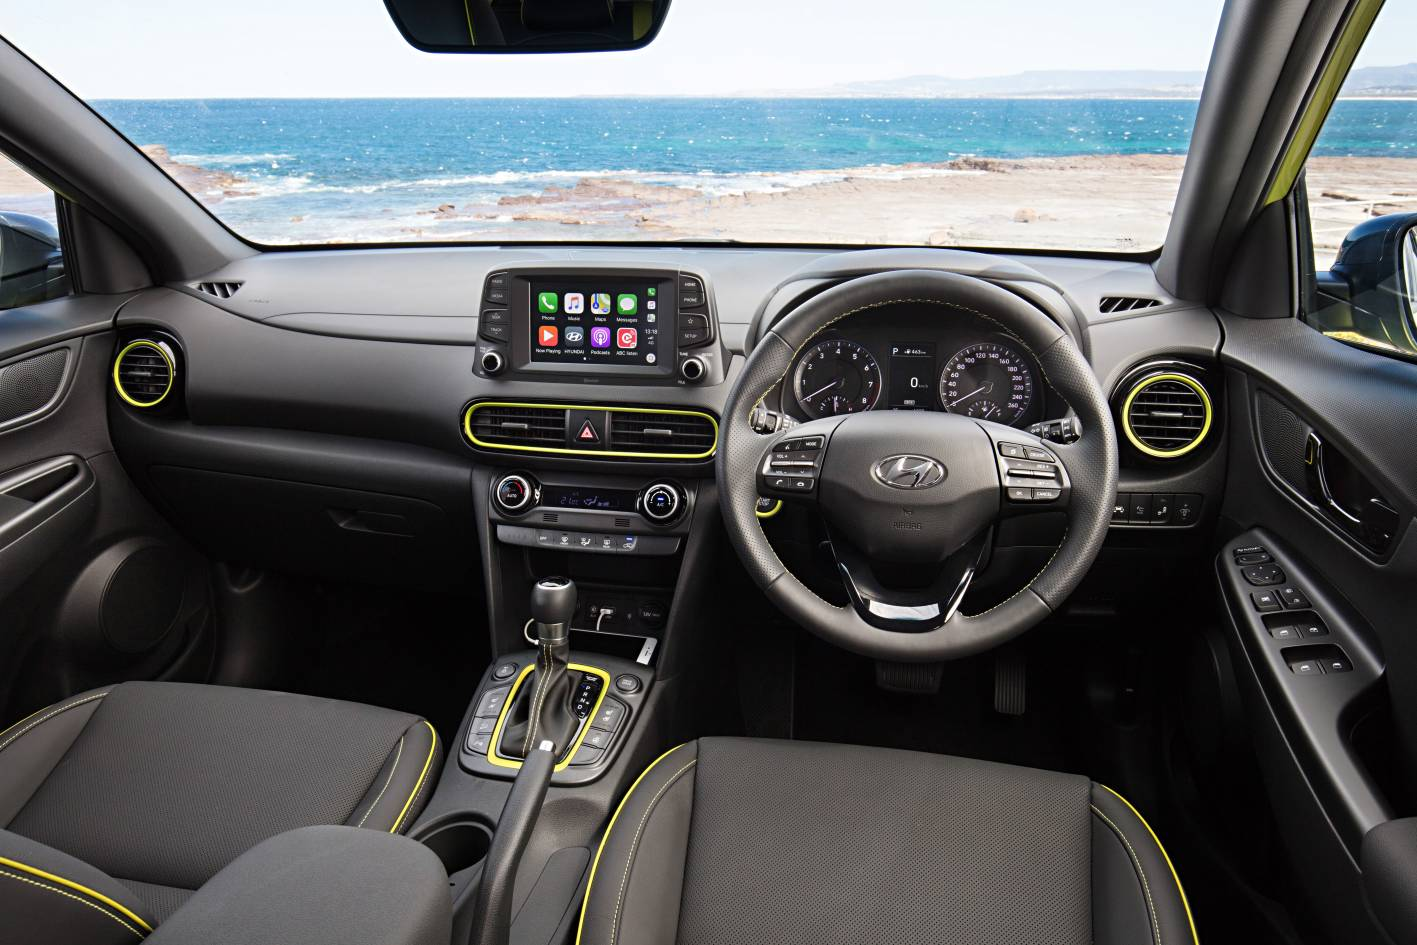 Hyundai Kona On Sale In Australia From 24 500